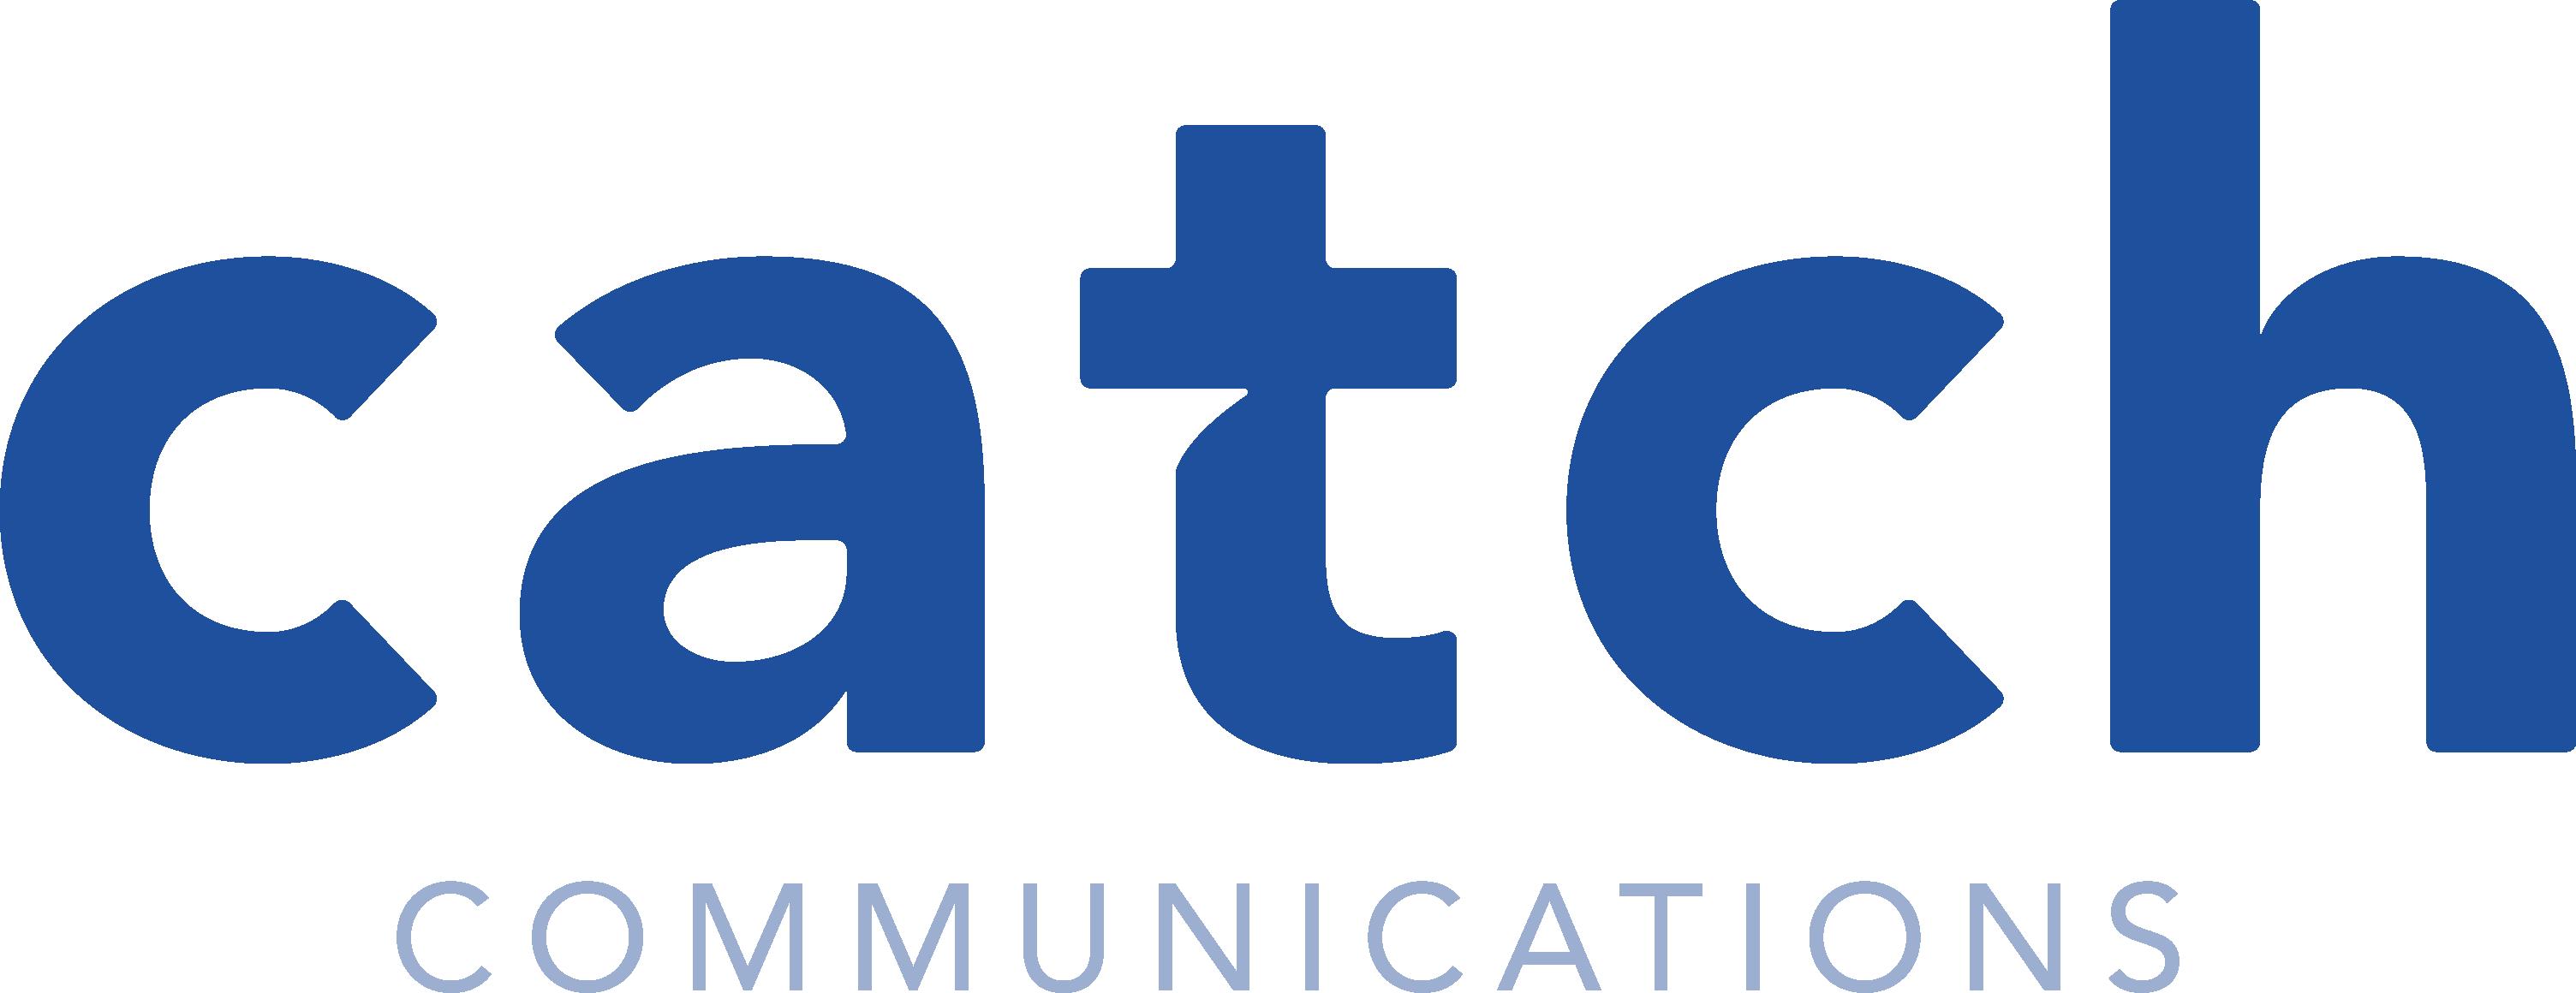 Catch Communications logo